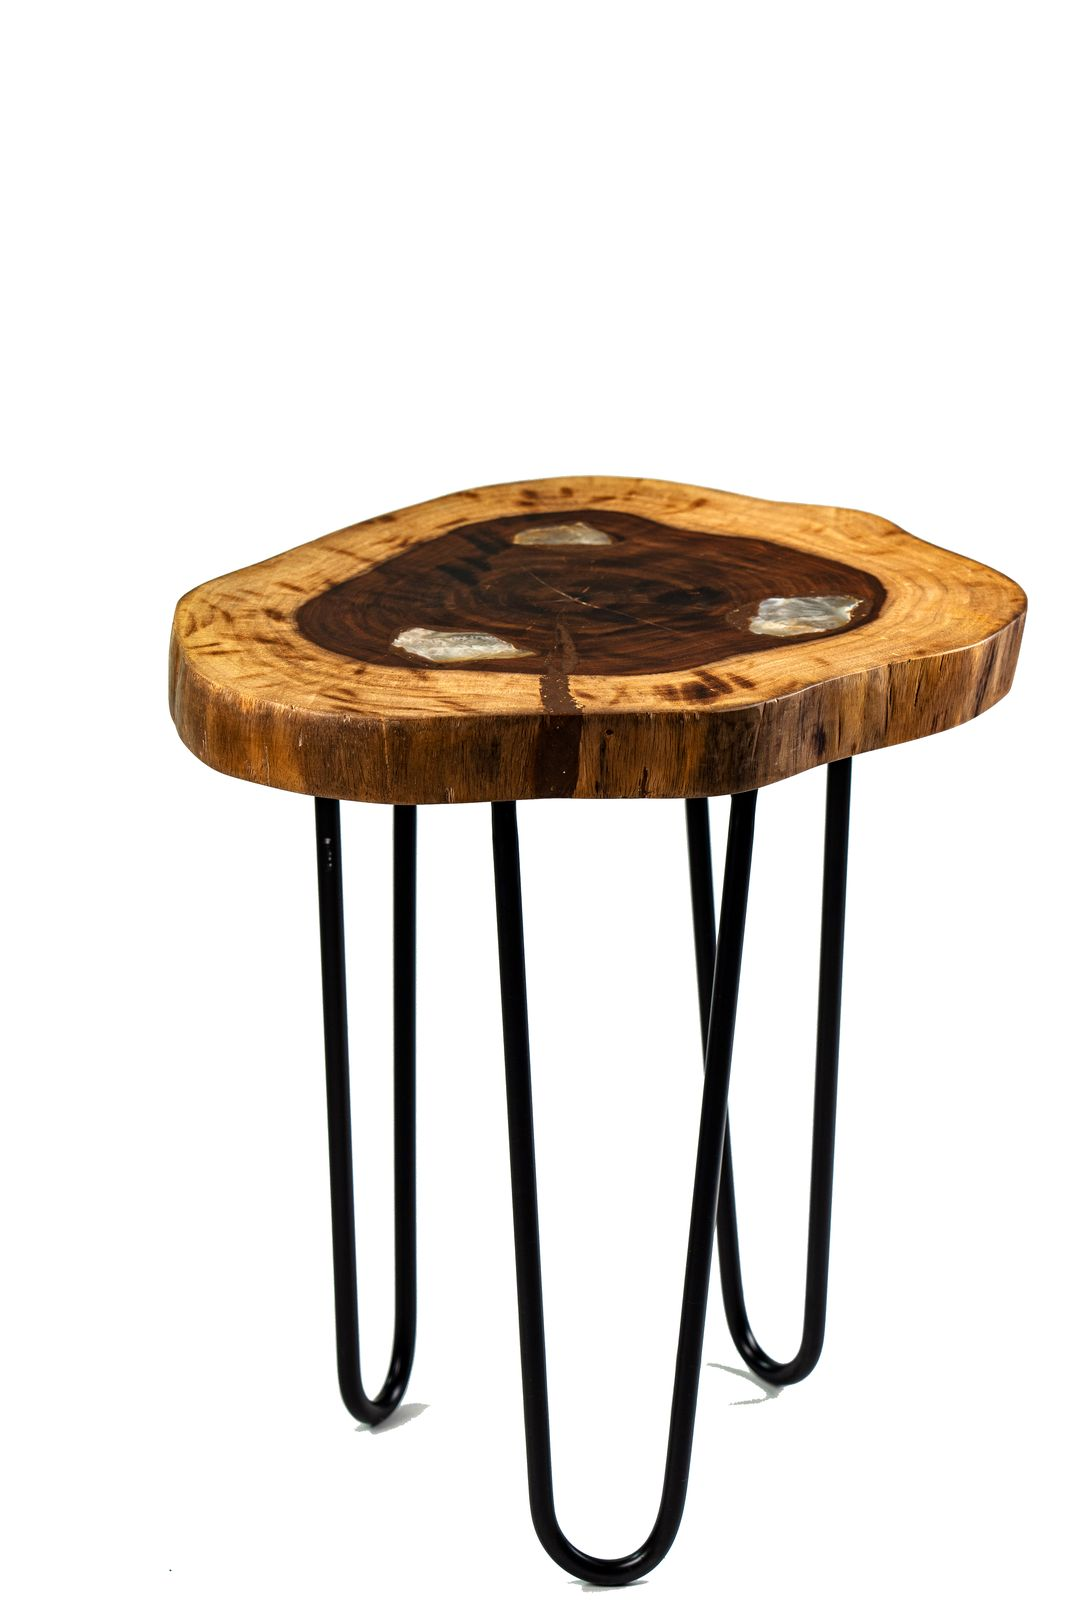 Приставной столик Agate & Wood 0.45x0.45x0.45м